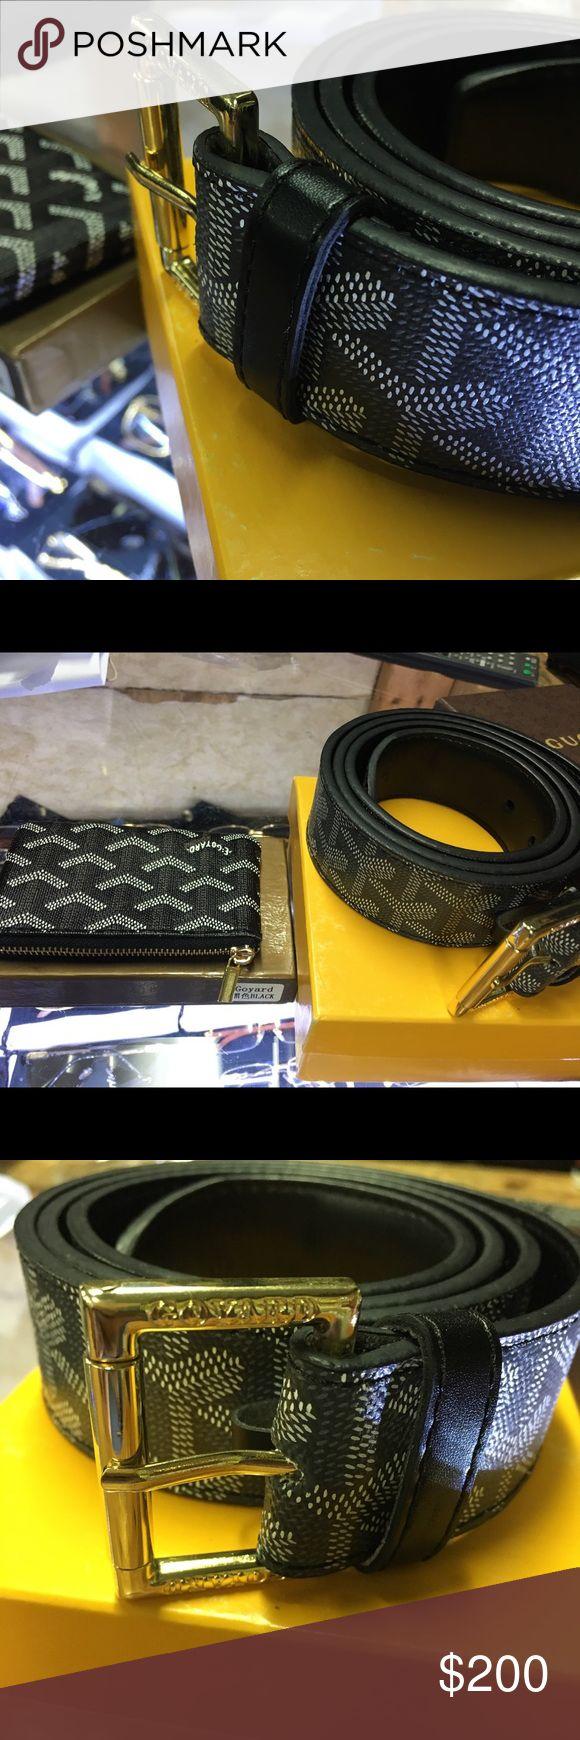 Goyard Belt and Card Holder Brand new Goyard belt and card holder. Size 36 Goyard Accessories Belts